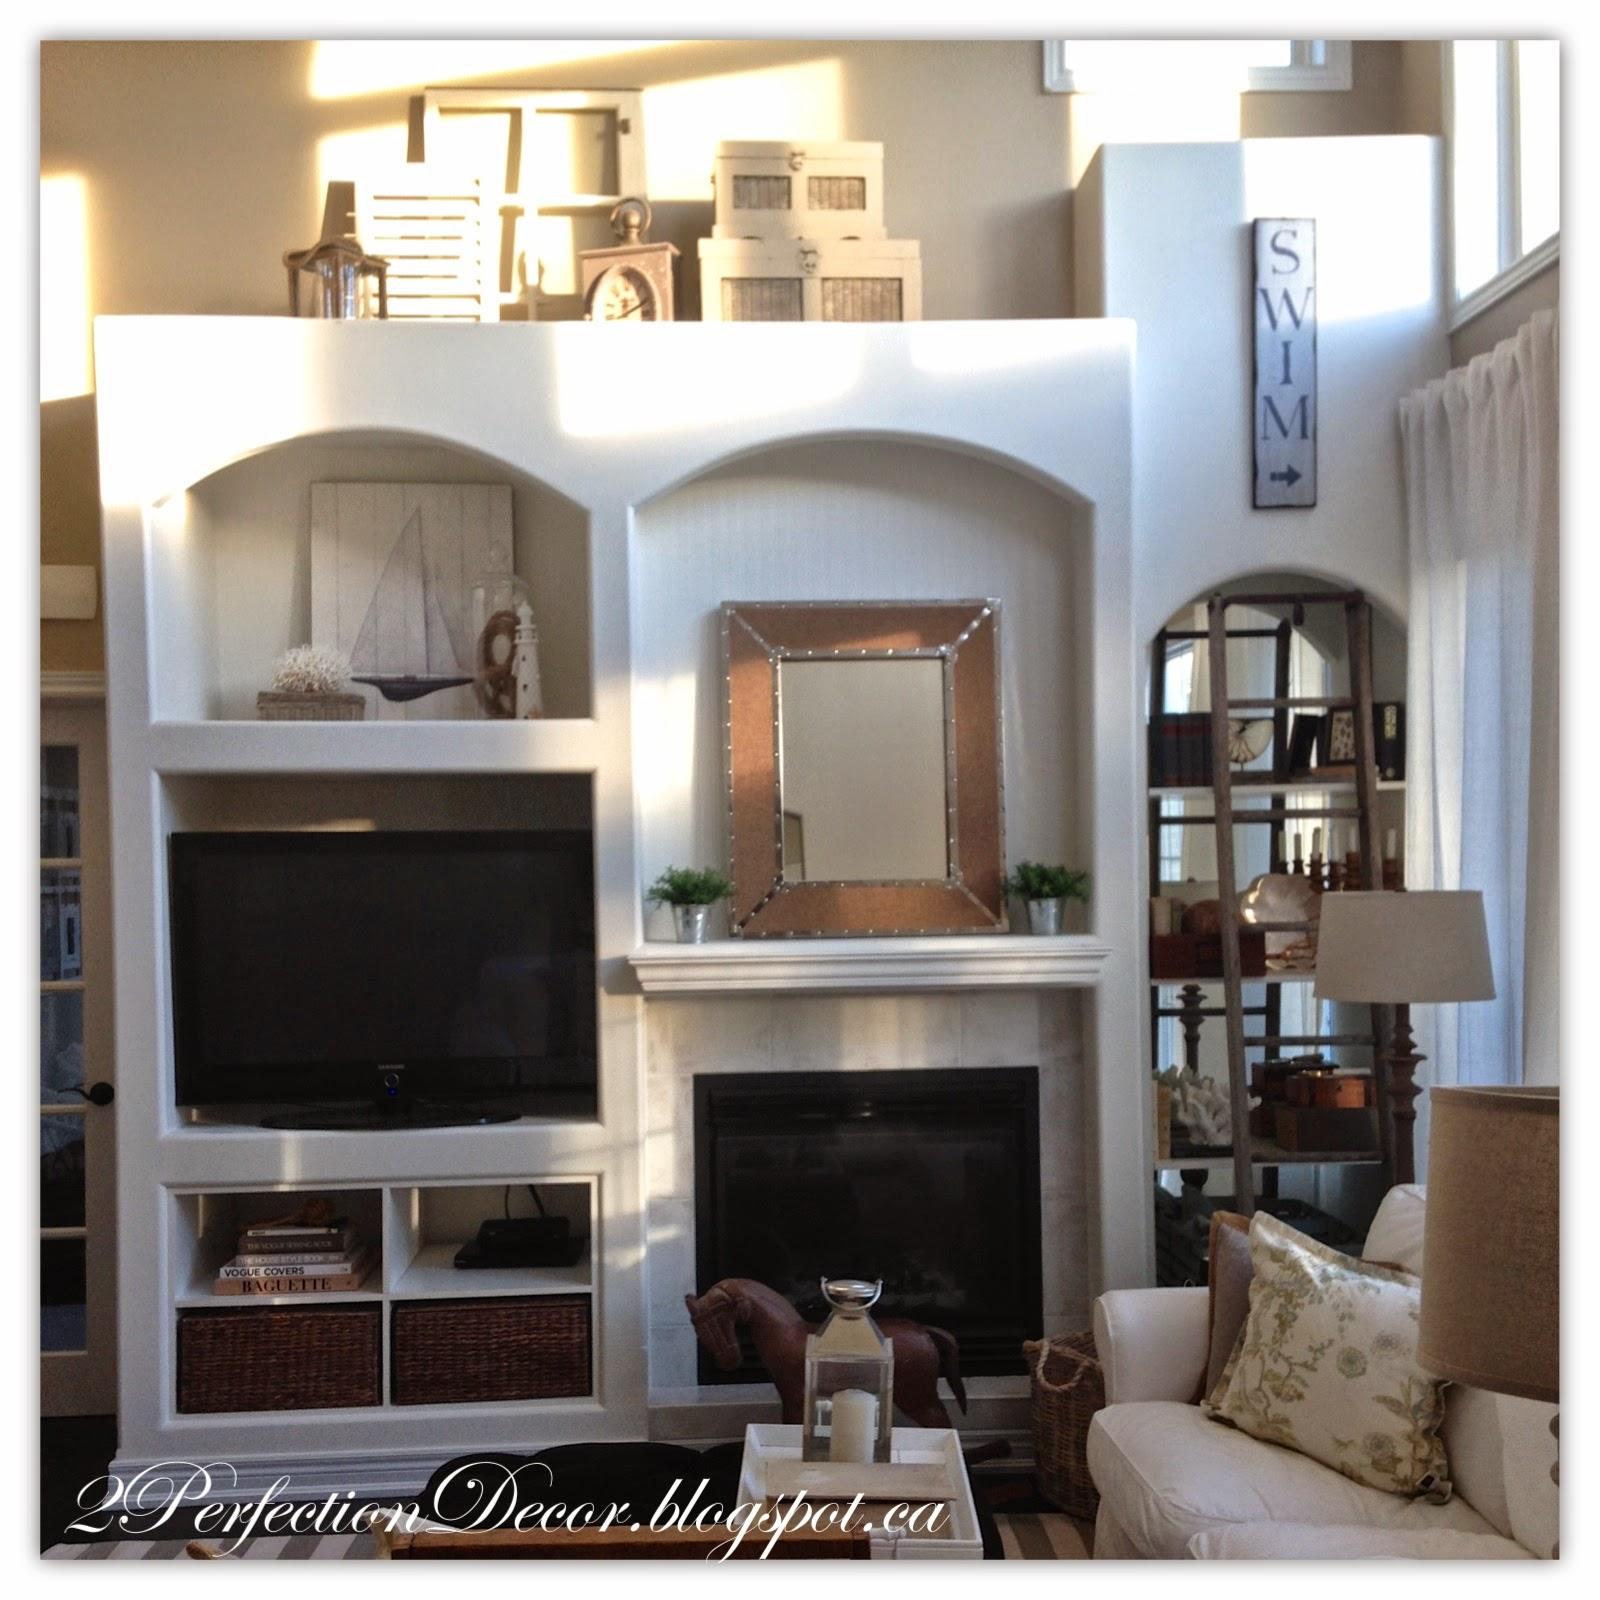 2perfection decor drywall media built ins u0026 styling